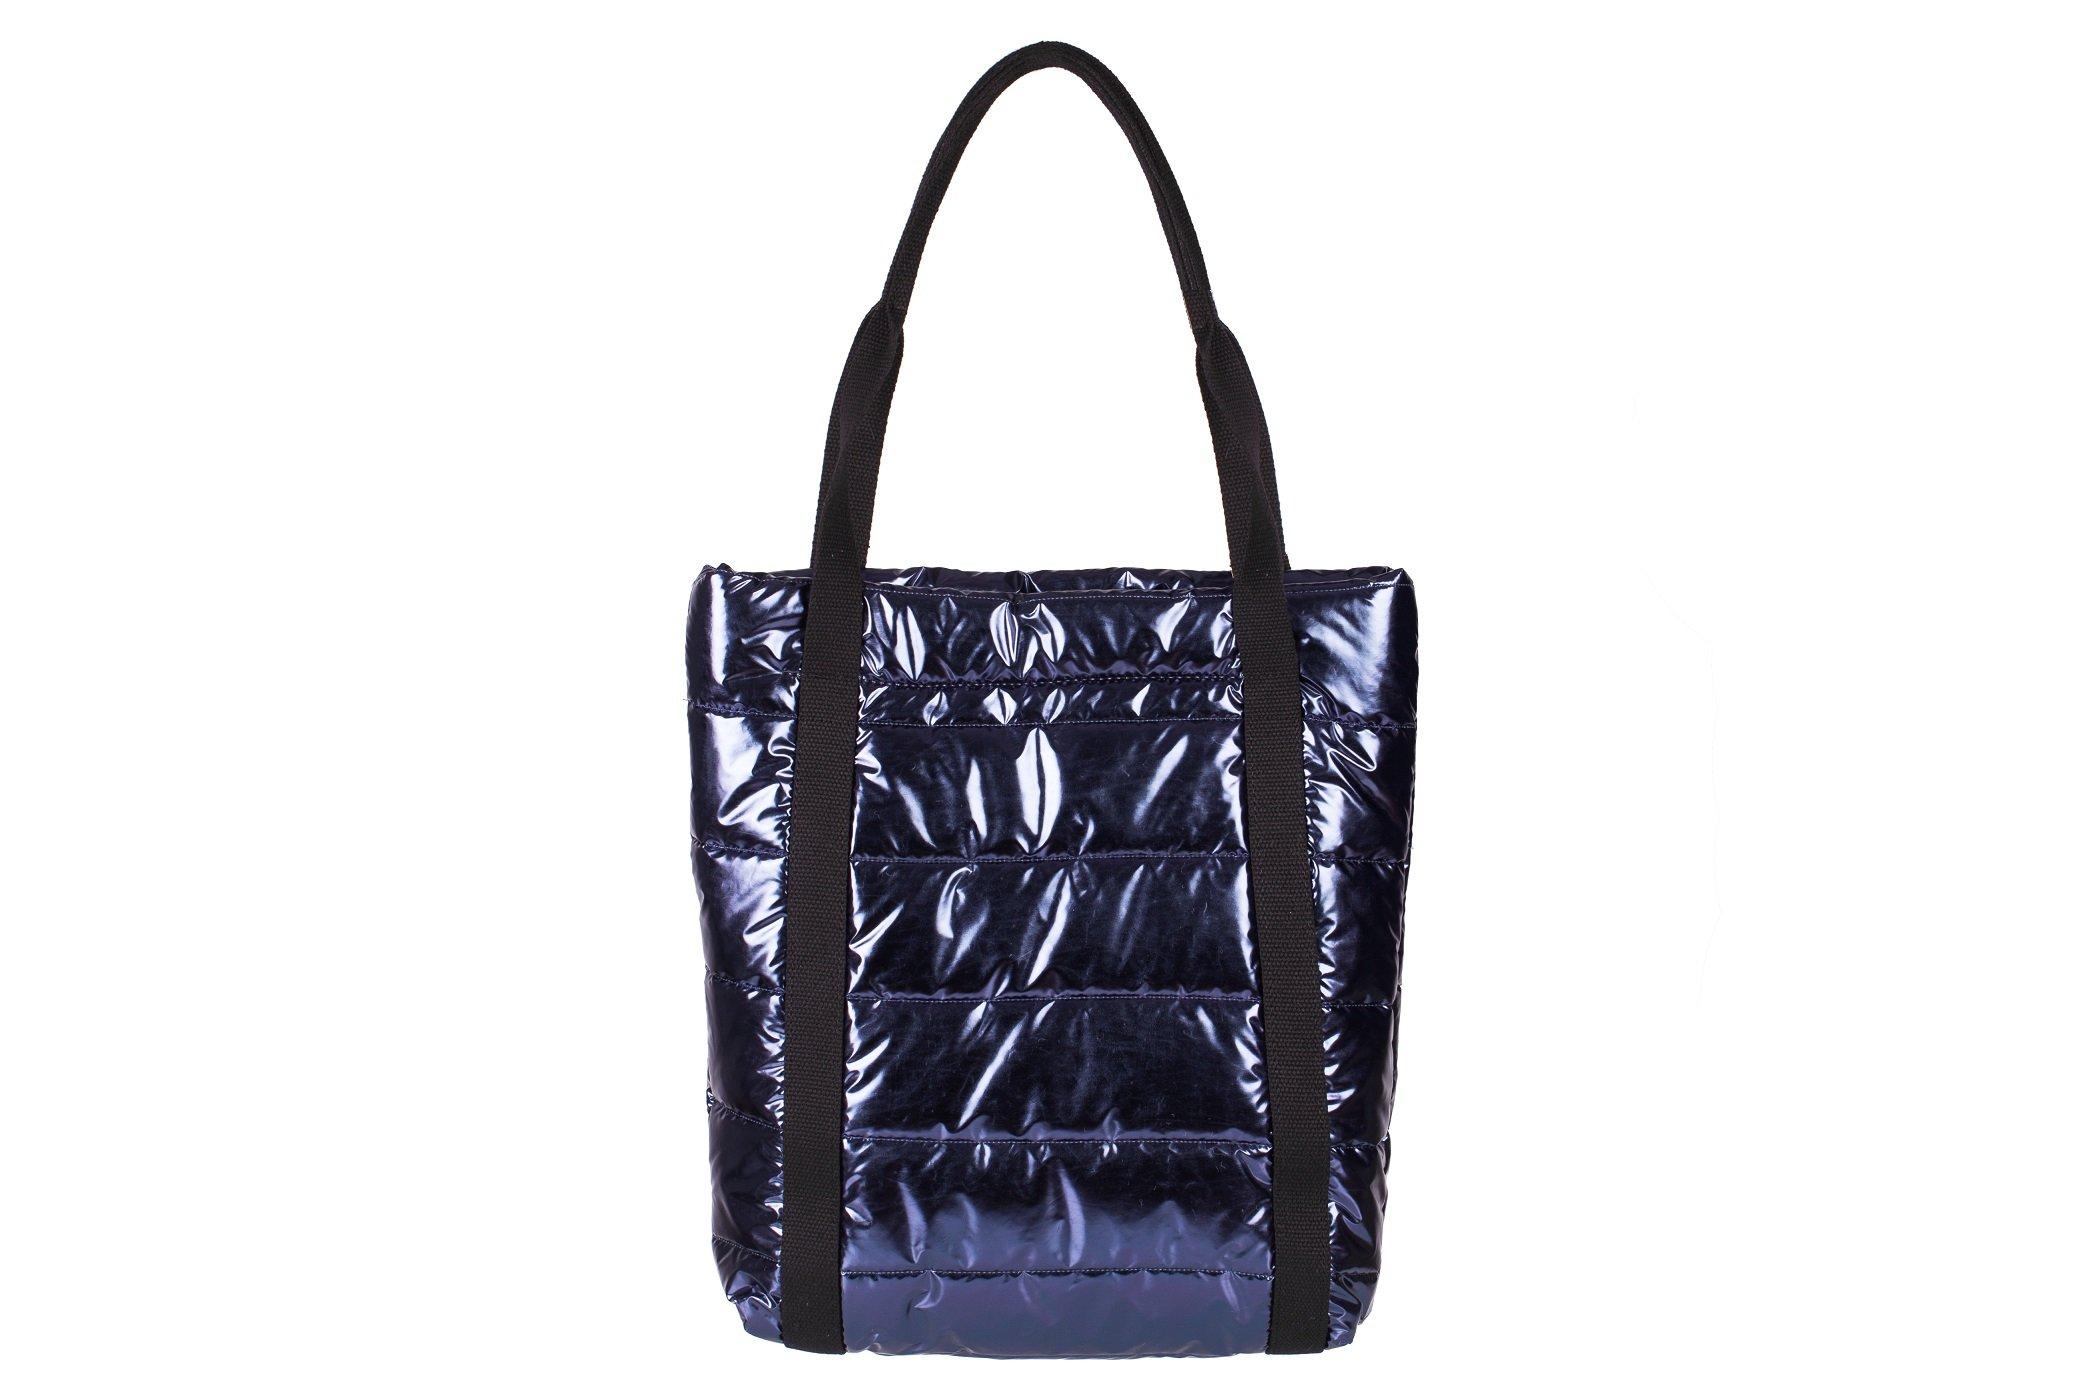 bf7109eeb3b74 ... Pojemna torebka damska na zakupy eko pikowana ...